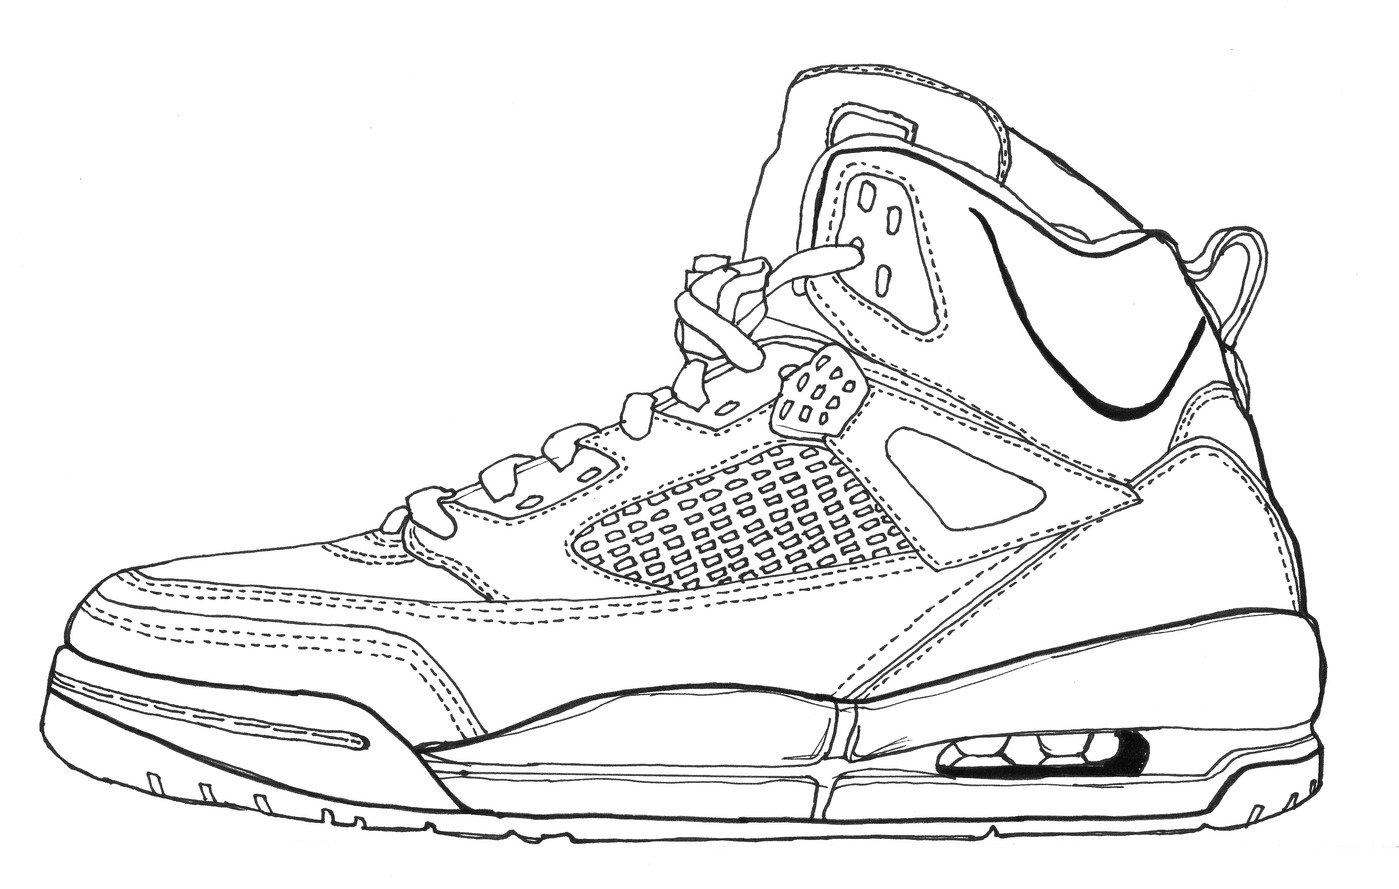 Footwear by Michael Ryan Zaleta at Coroflot.com